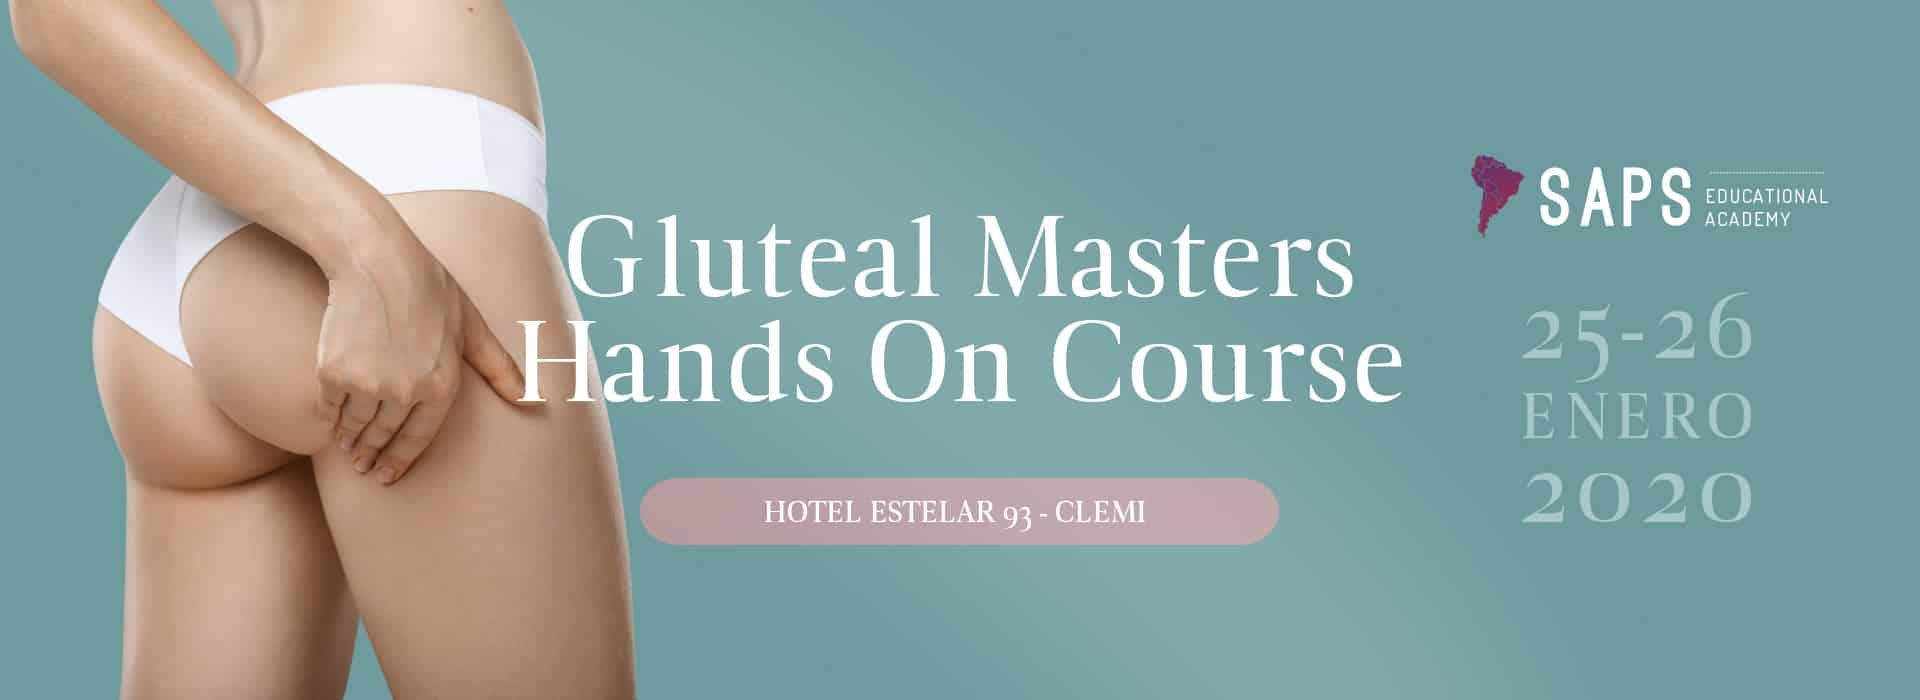 Gluteal Master SAPS Academy